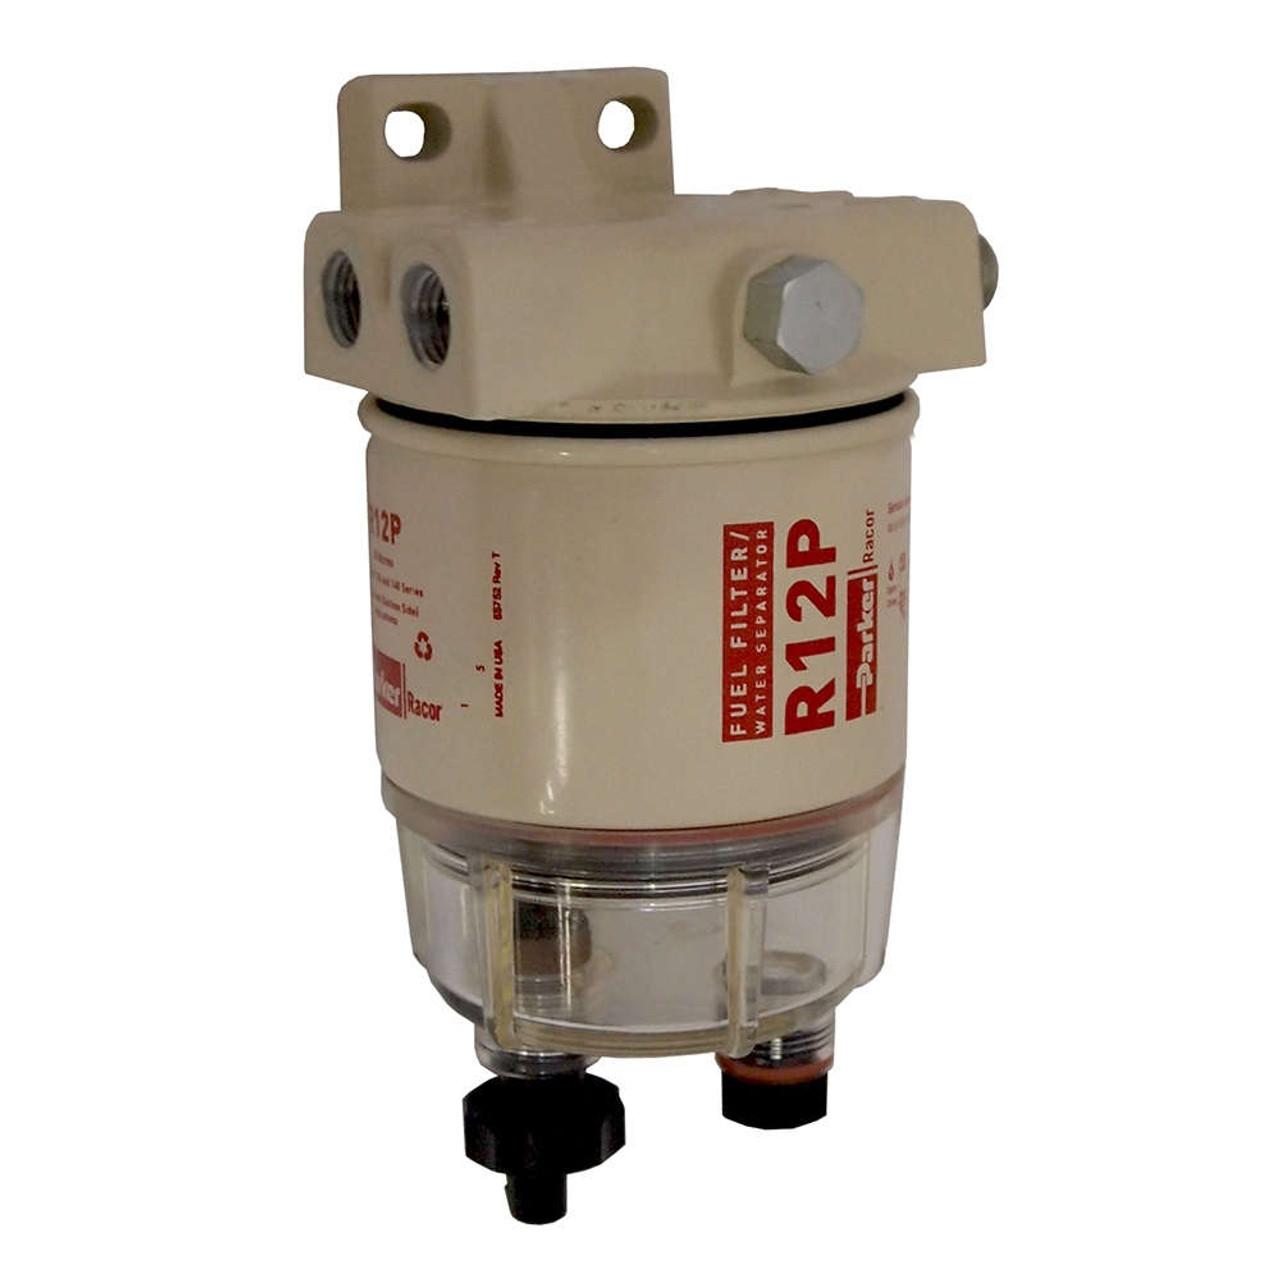 Racor 120A Low Flow Fuel Filter/Water Separator Filter Assembly - 30 Micron  - John M. Ellsworth Co. Inc.John M. Ellsworth